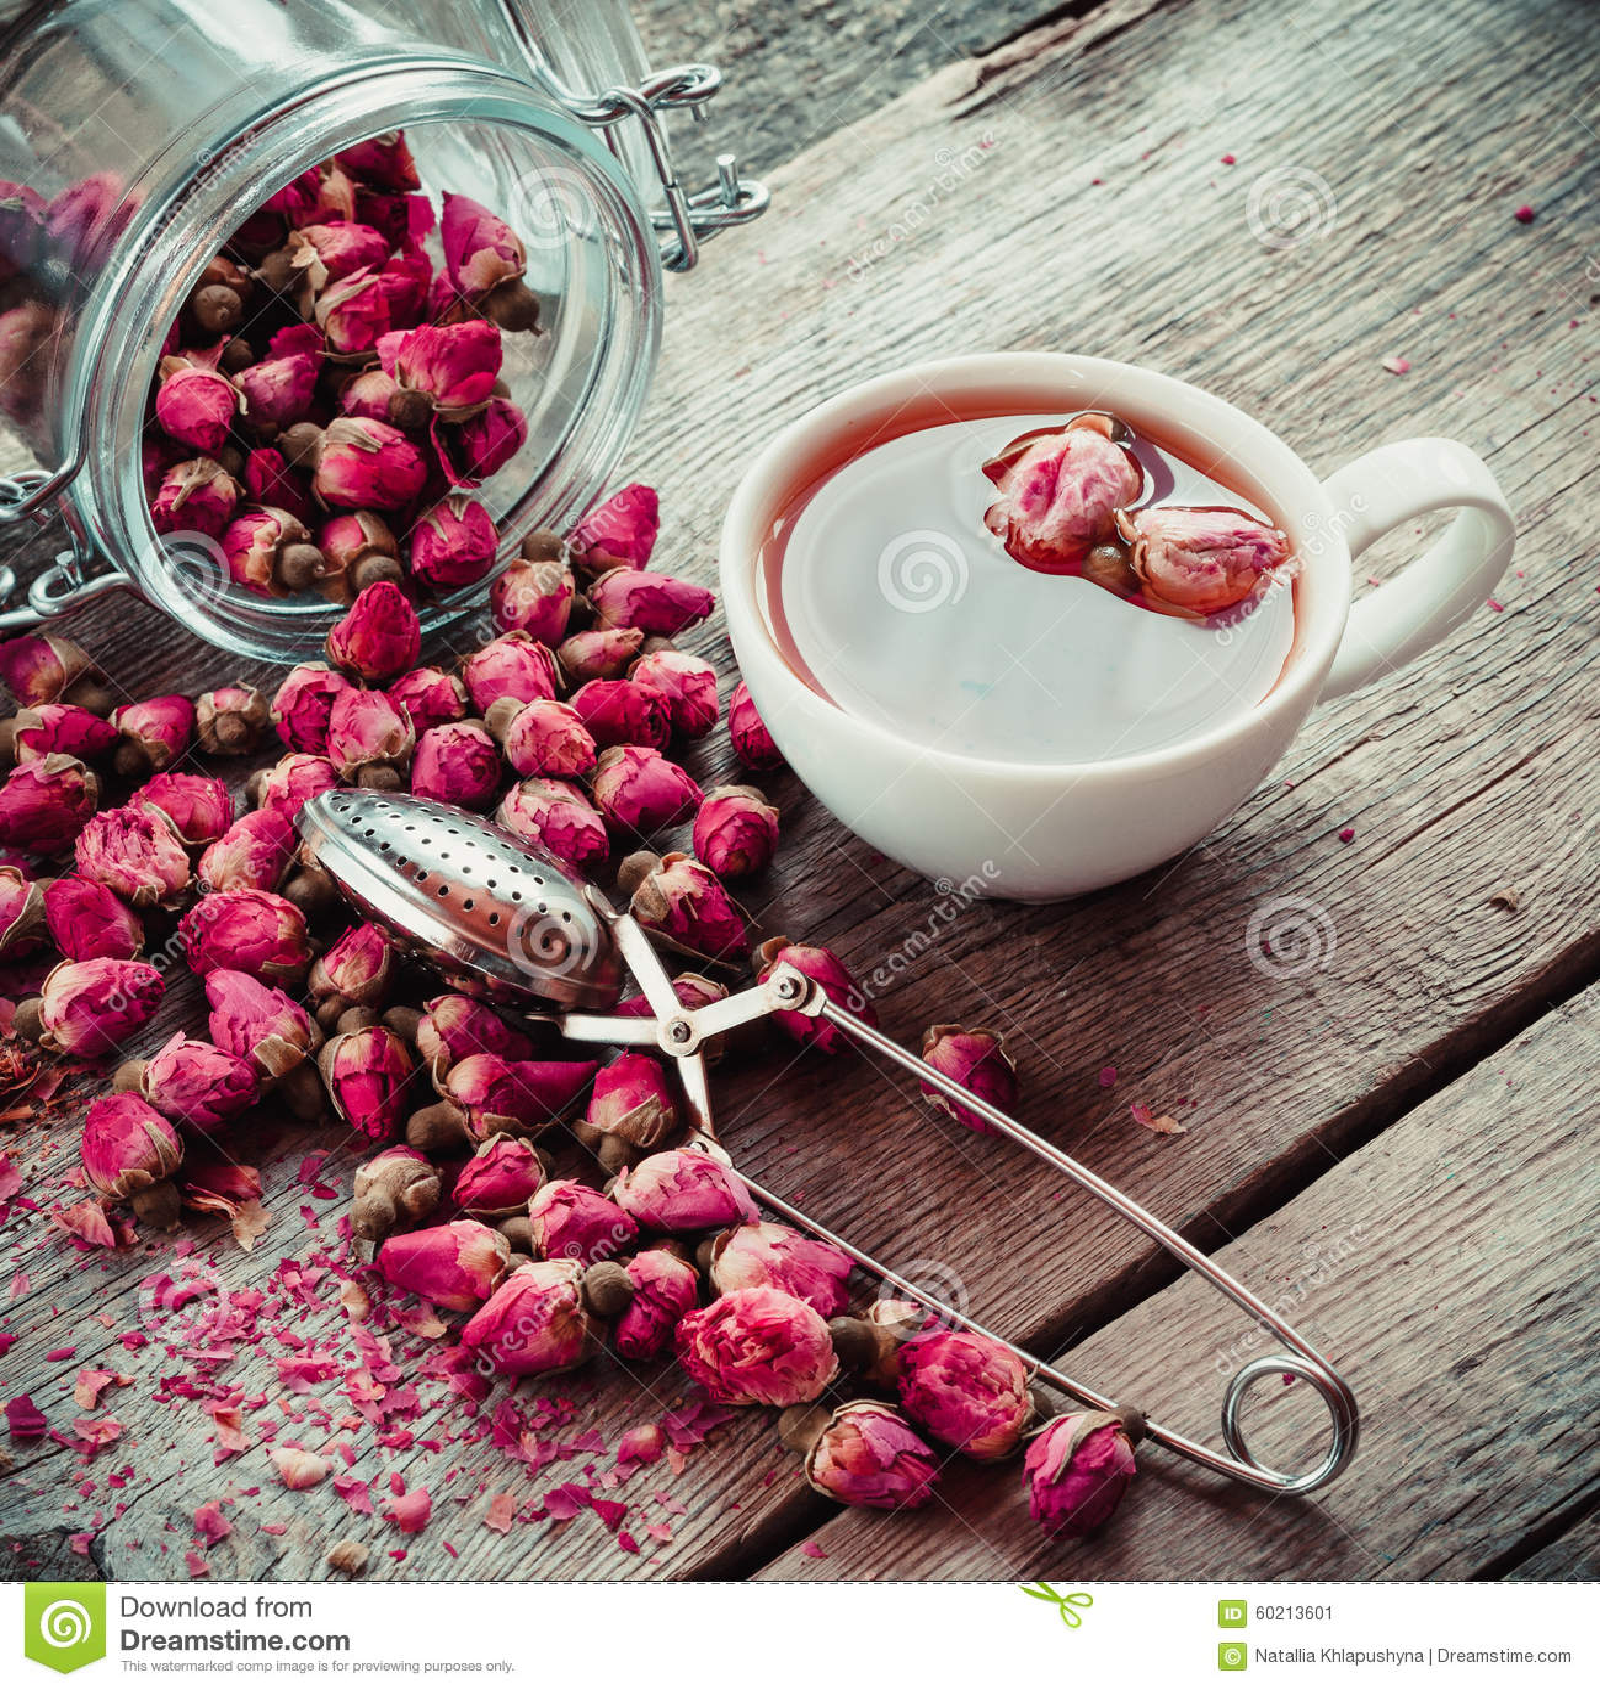 rose flowers tea cup strainer and glass jar with rose buds stock image image 60213601. Black Bedroom Furniture Sets. Home Design Ideas